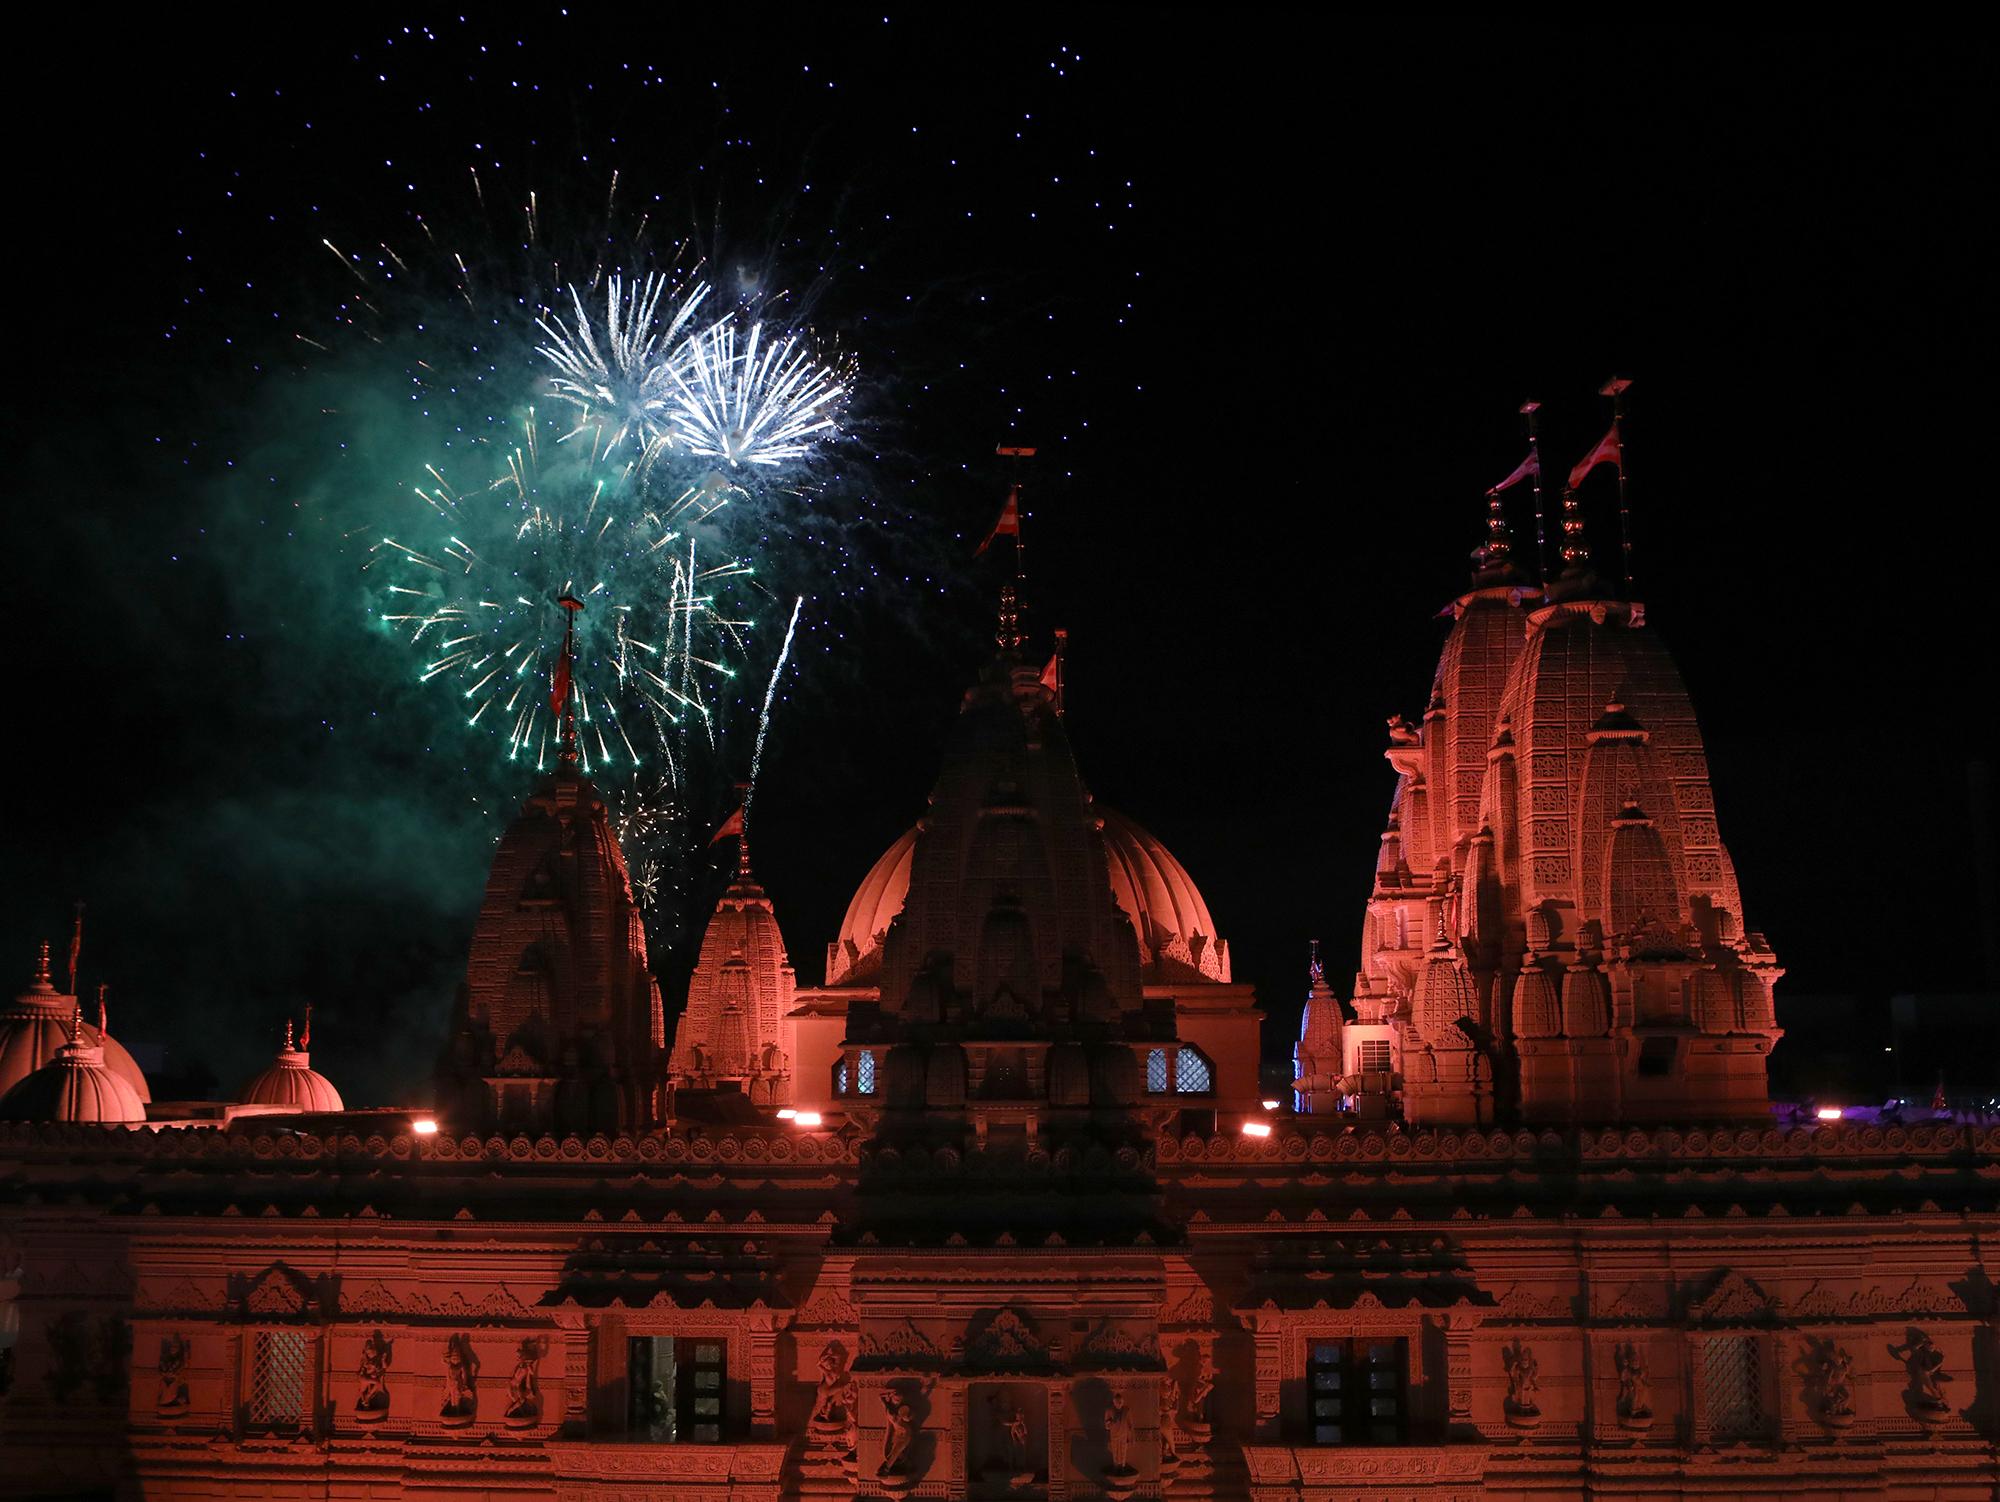 181107_london_diwali-fireworks_01